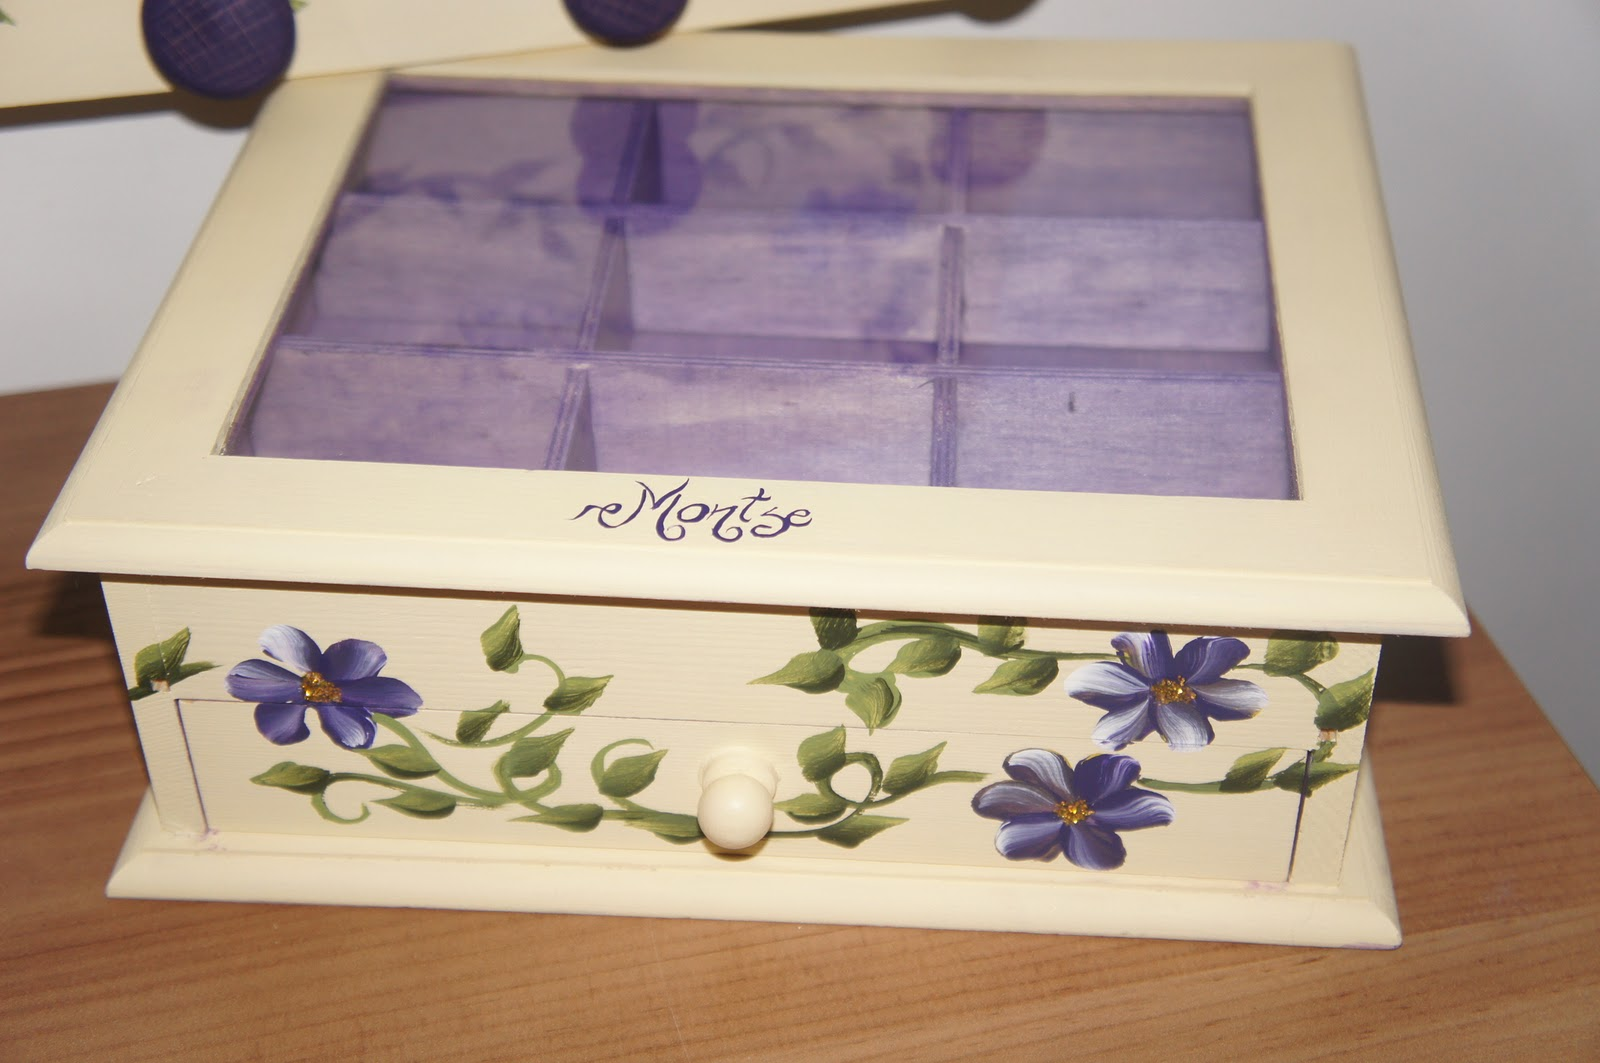 Artesania abona cajas con flores pintadas a mano - Cajas decoradas a mano ...